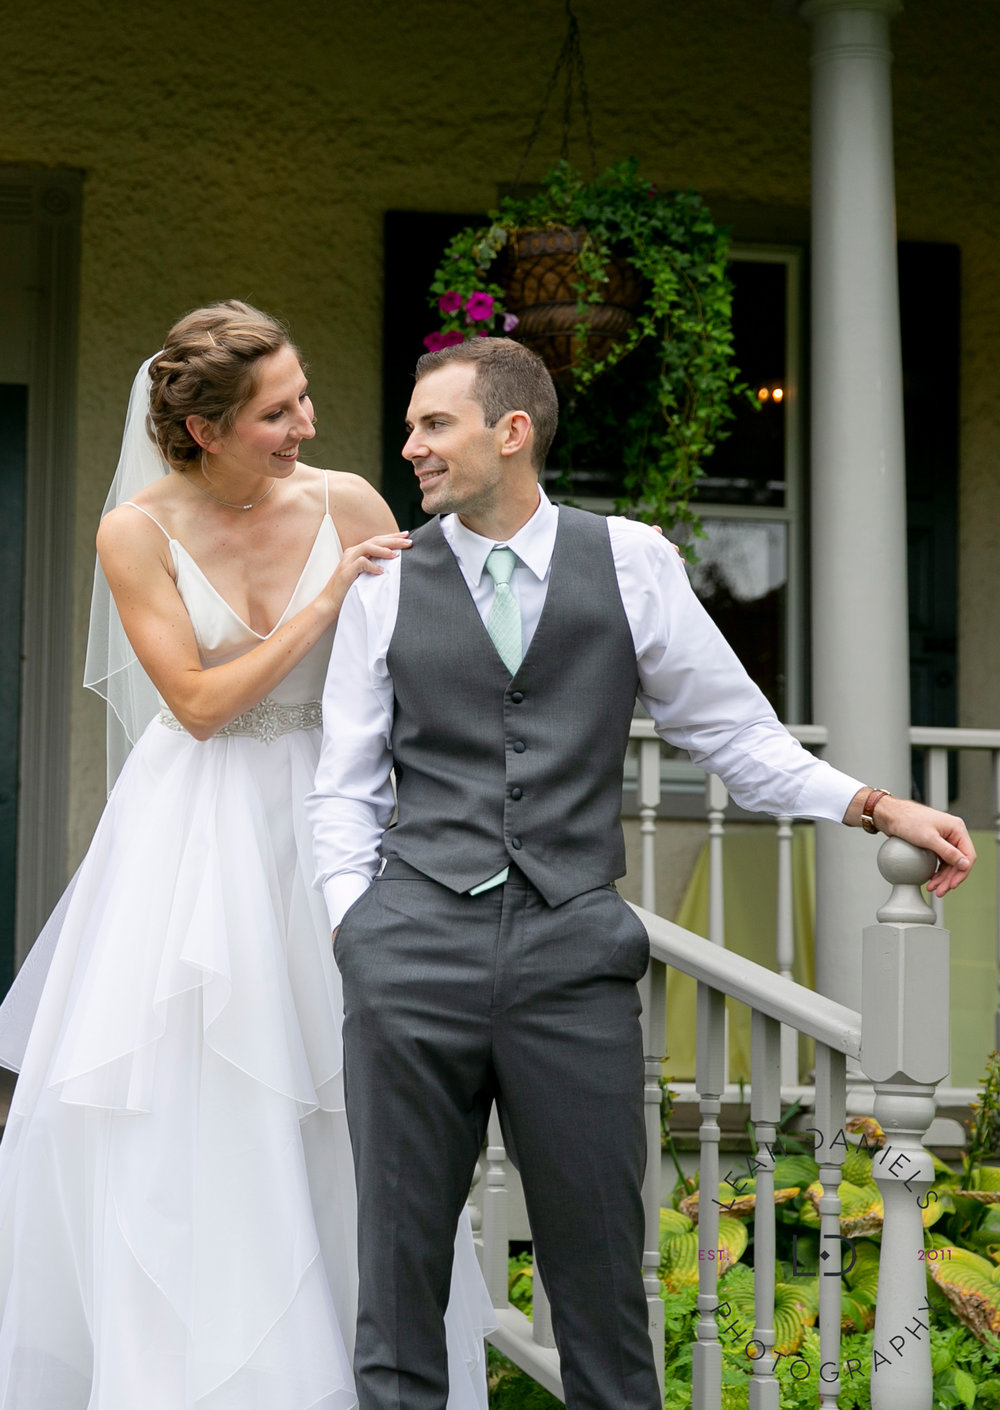 Springton Manor Farm Wedding - First Look